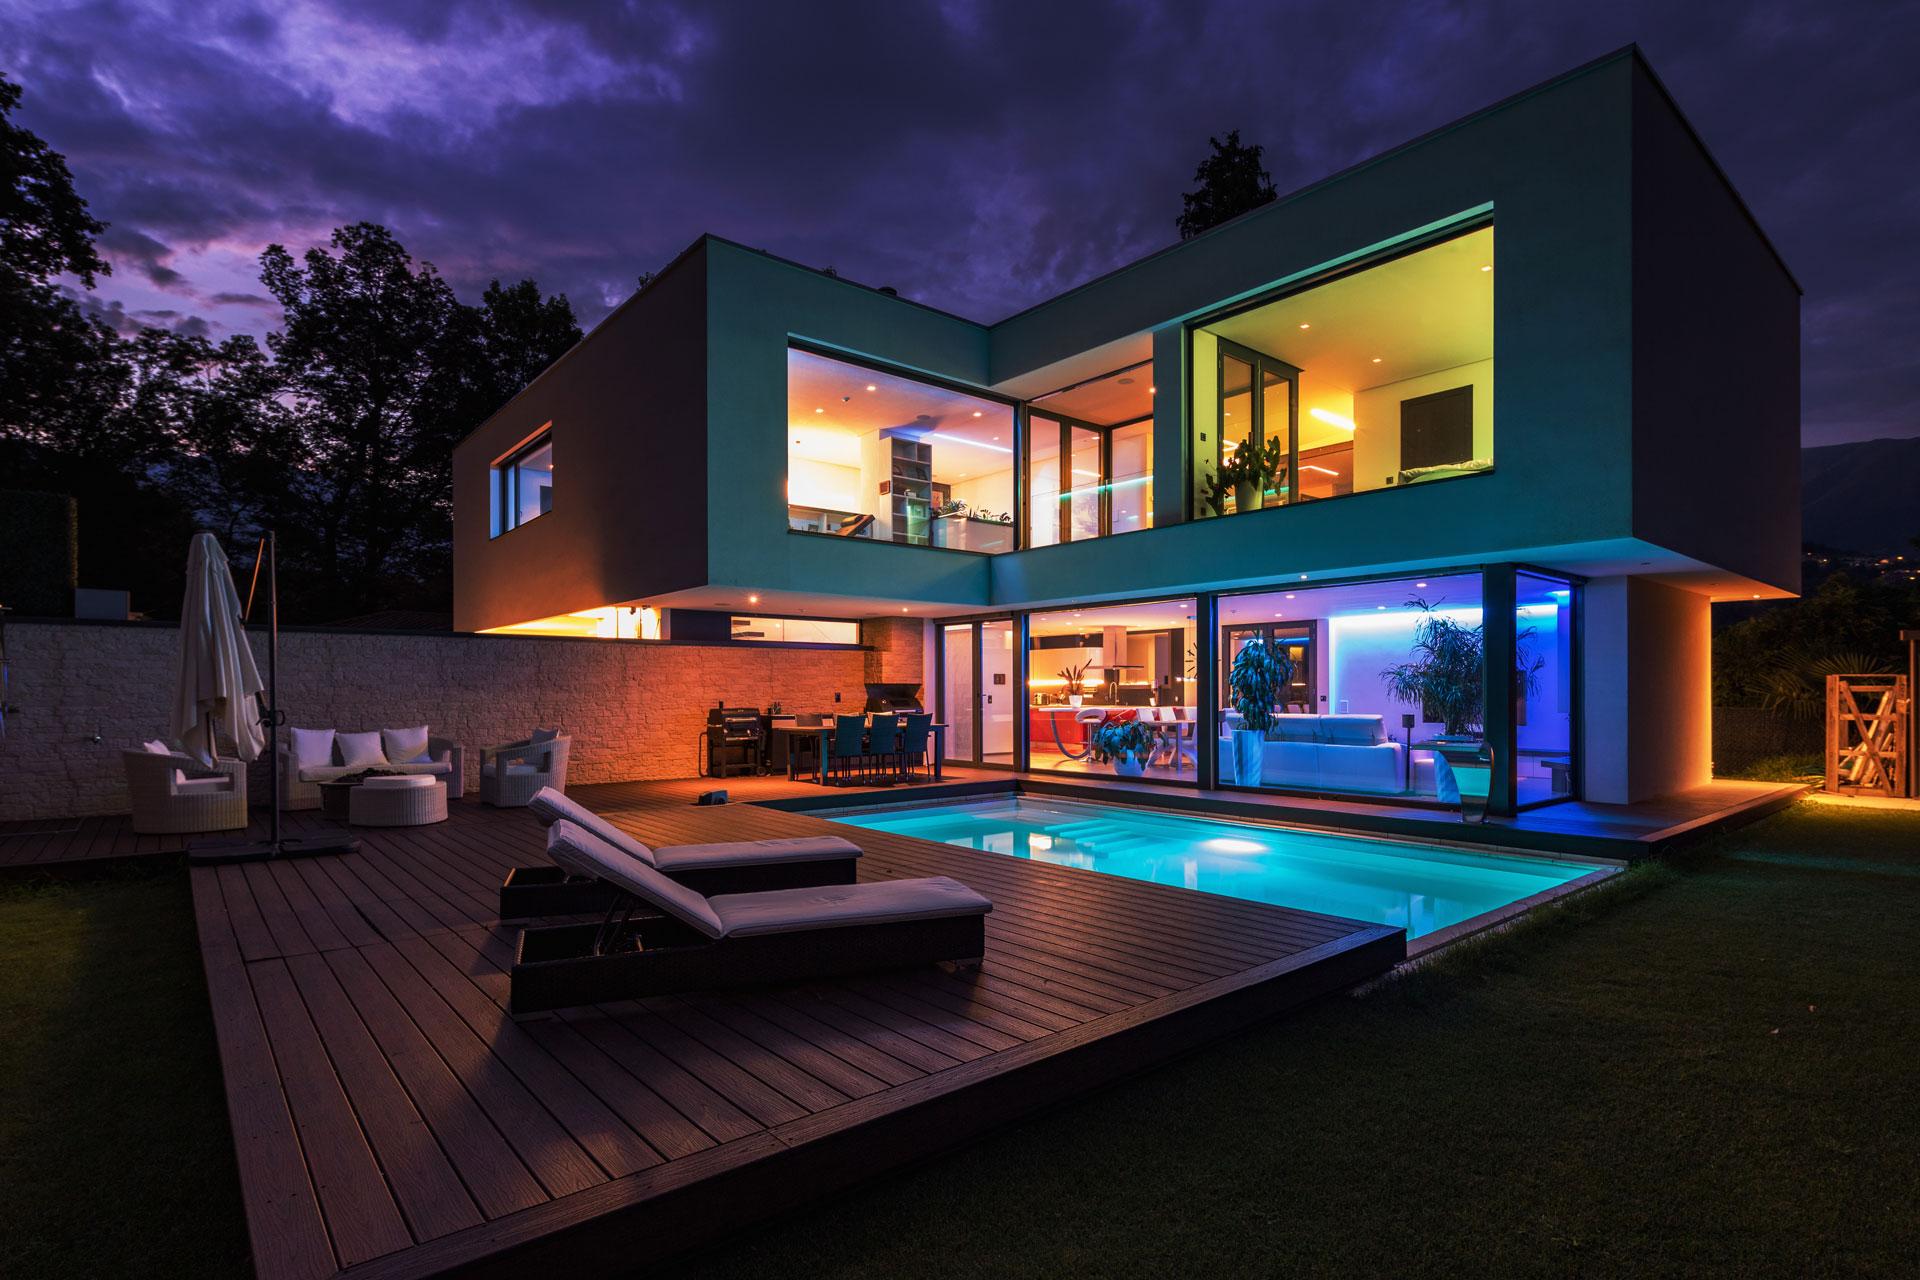 AB-Audio-Visual-Smart-Mood-Lighting-Iconic-Home-1920x1280-Image